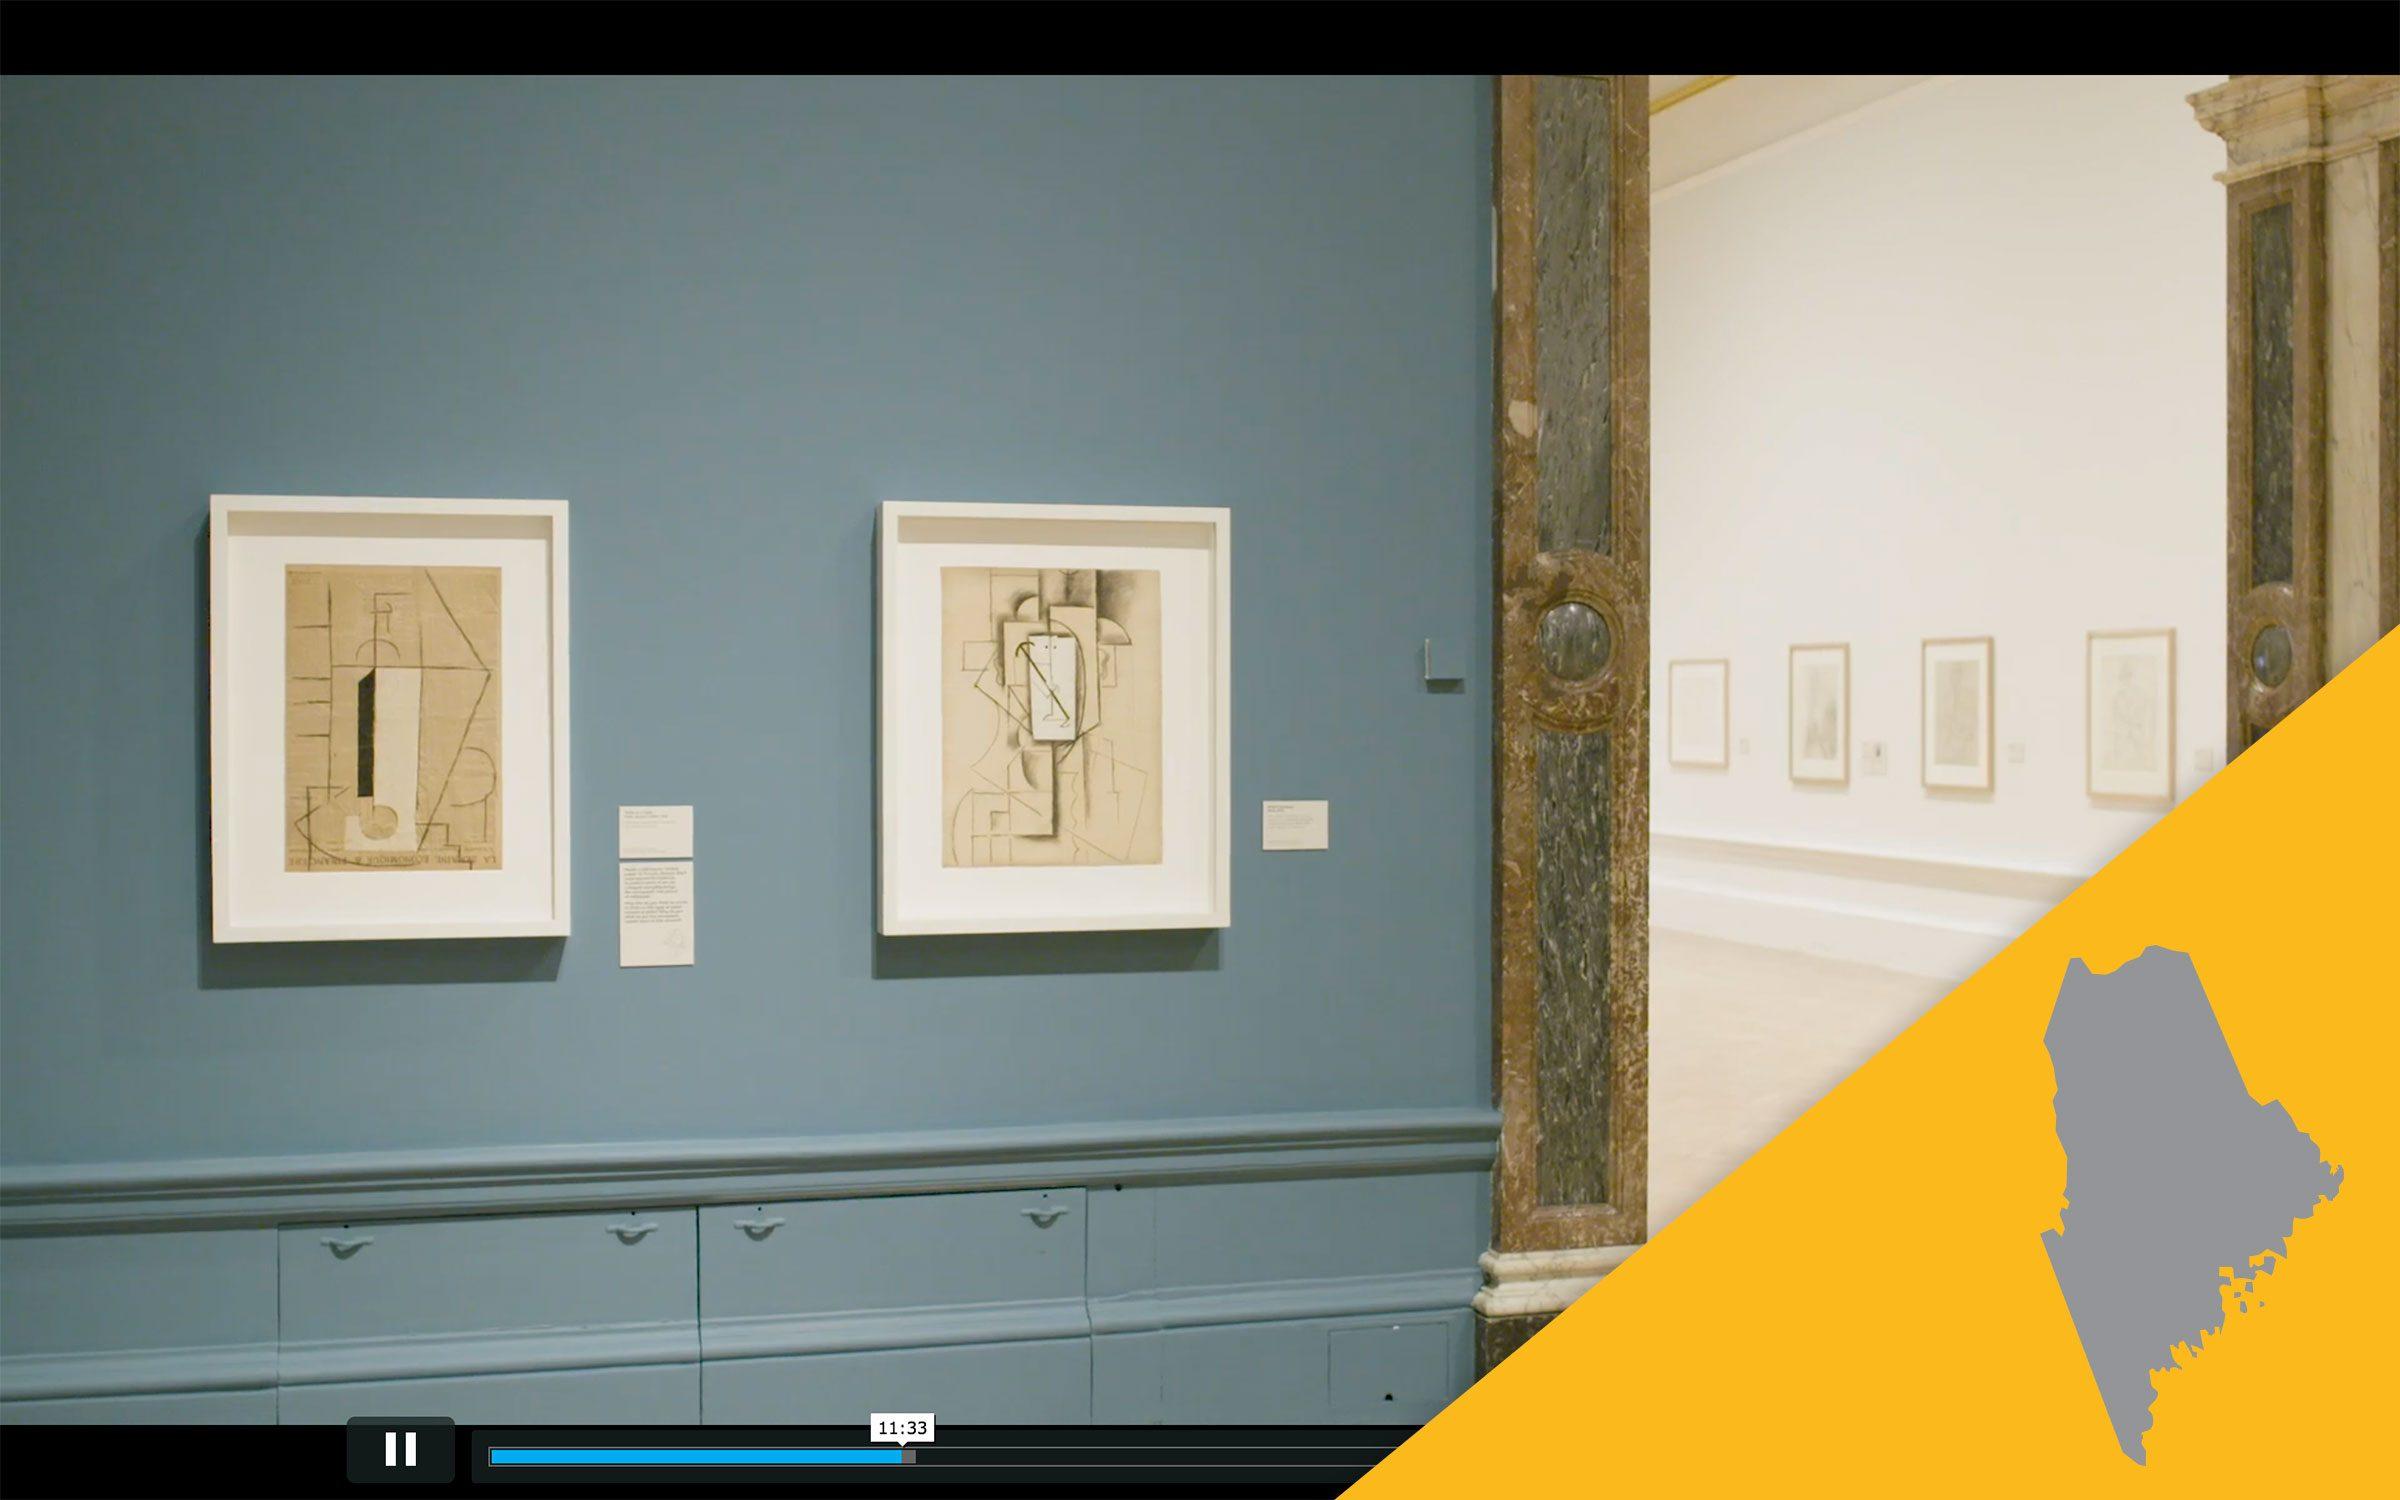 Royal Academy of Arts virtual tour